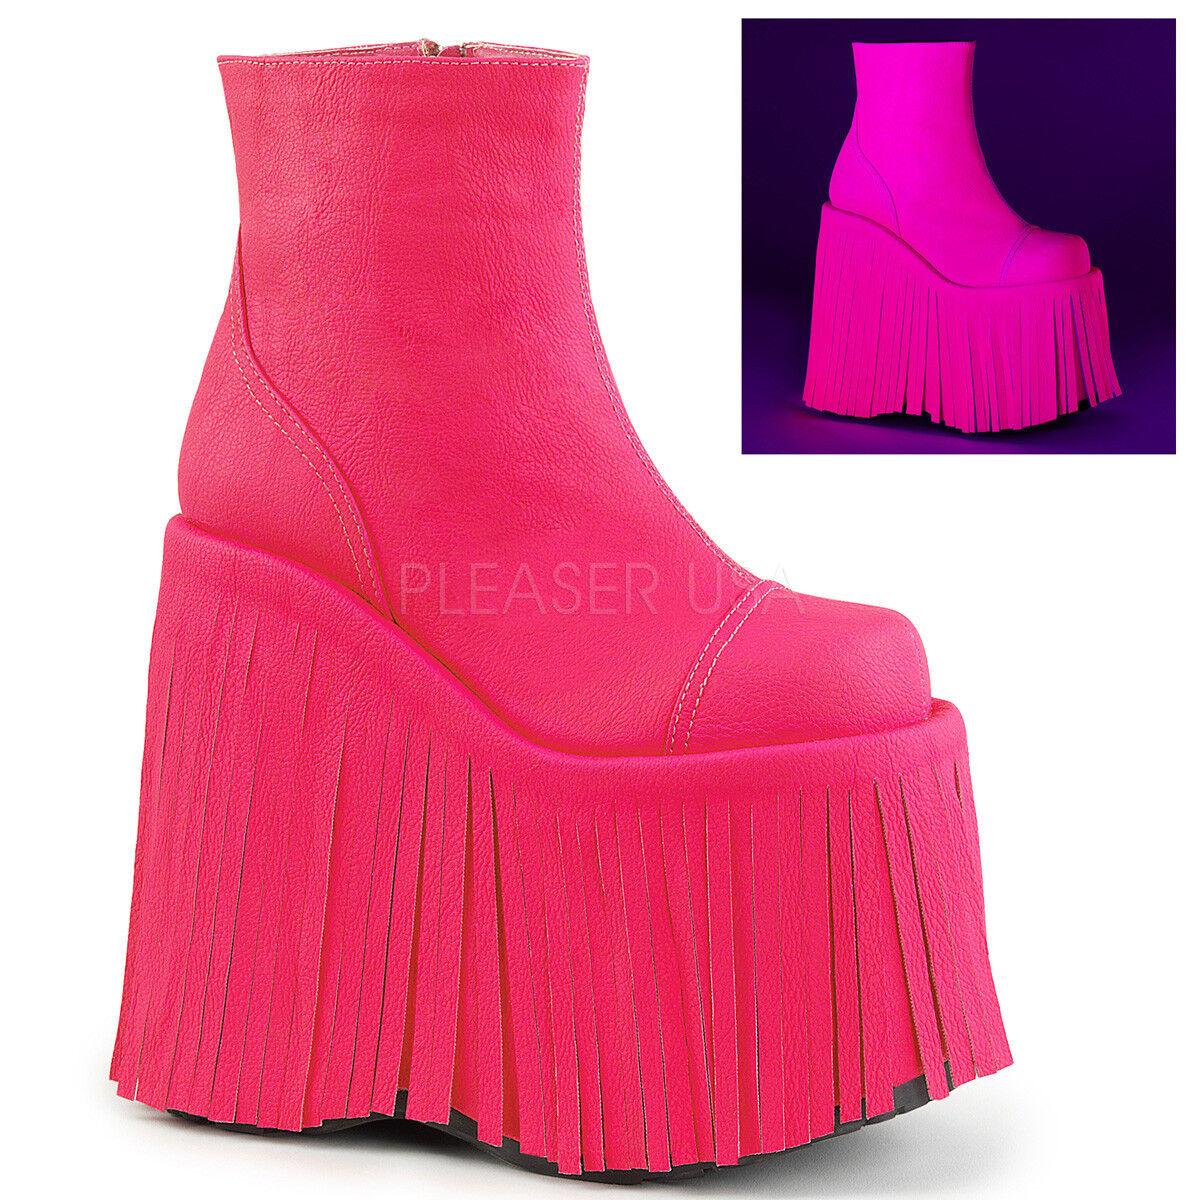 negozio online Demonia SLAY-205 donna Hot rosa Leather Fringed Fringed Fringed Platform Club scarpe Ankle avvio  il più recente